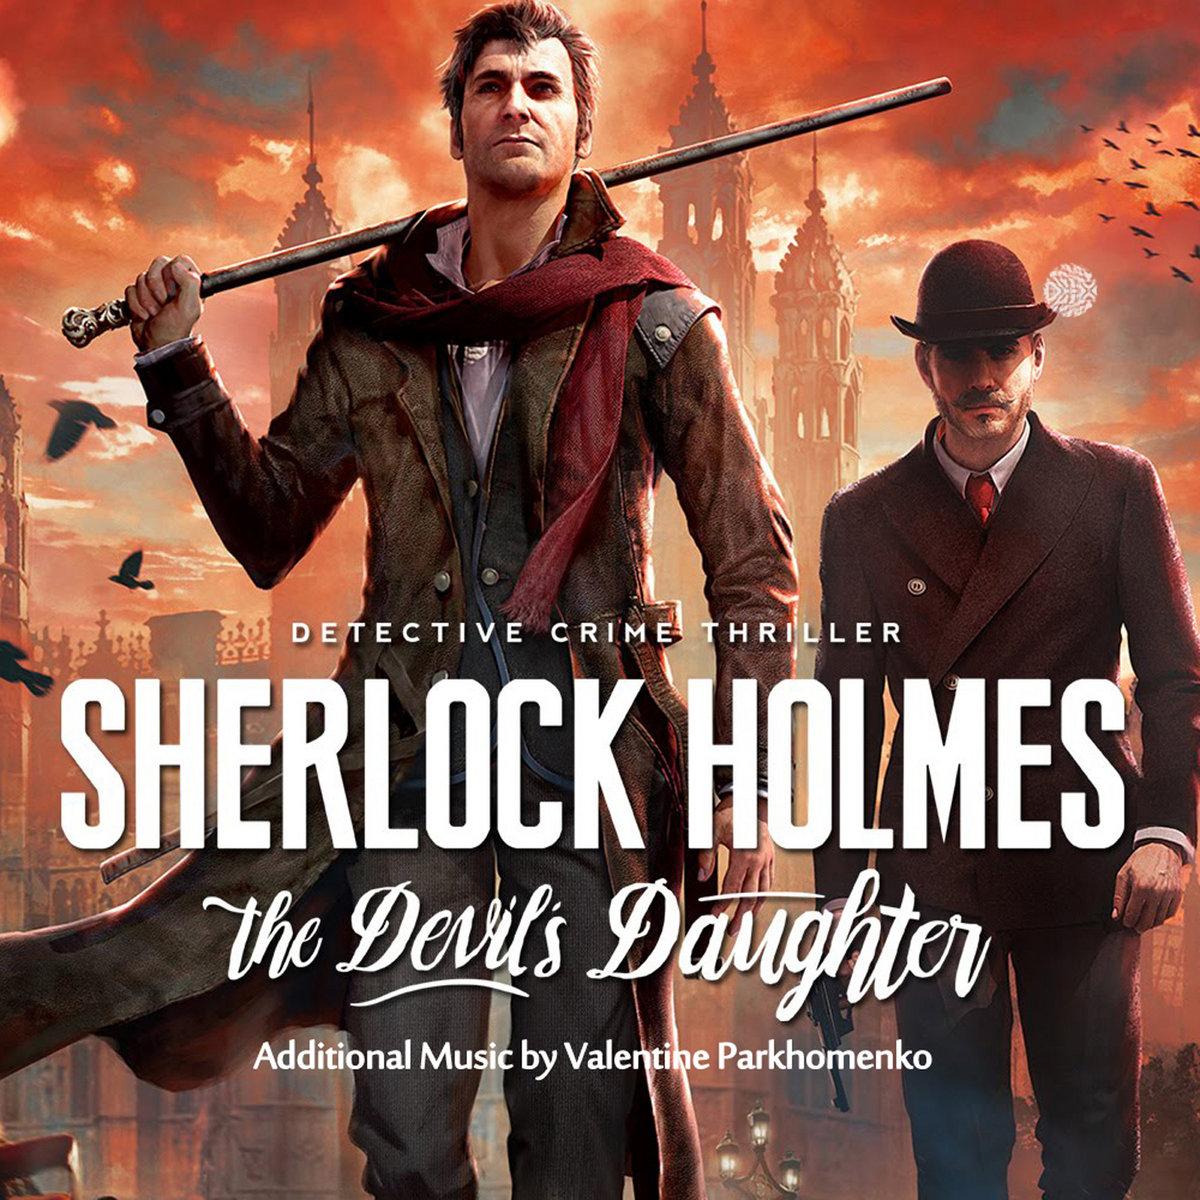 Sherlock holmes audiobook free download mp3 online streaming.